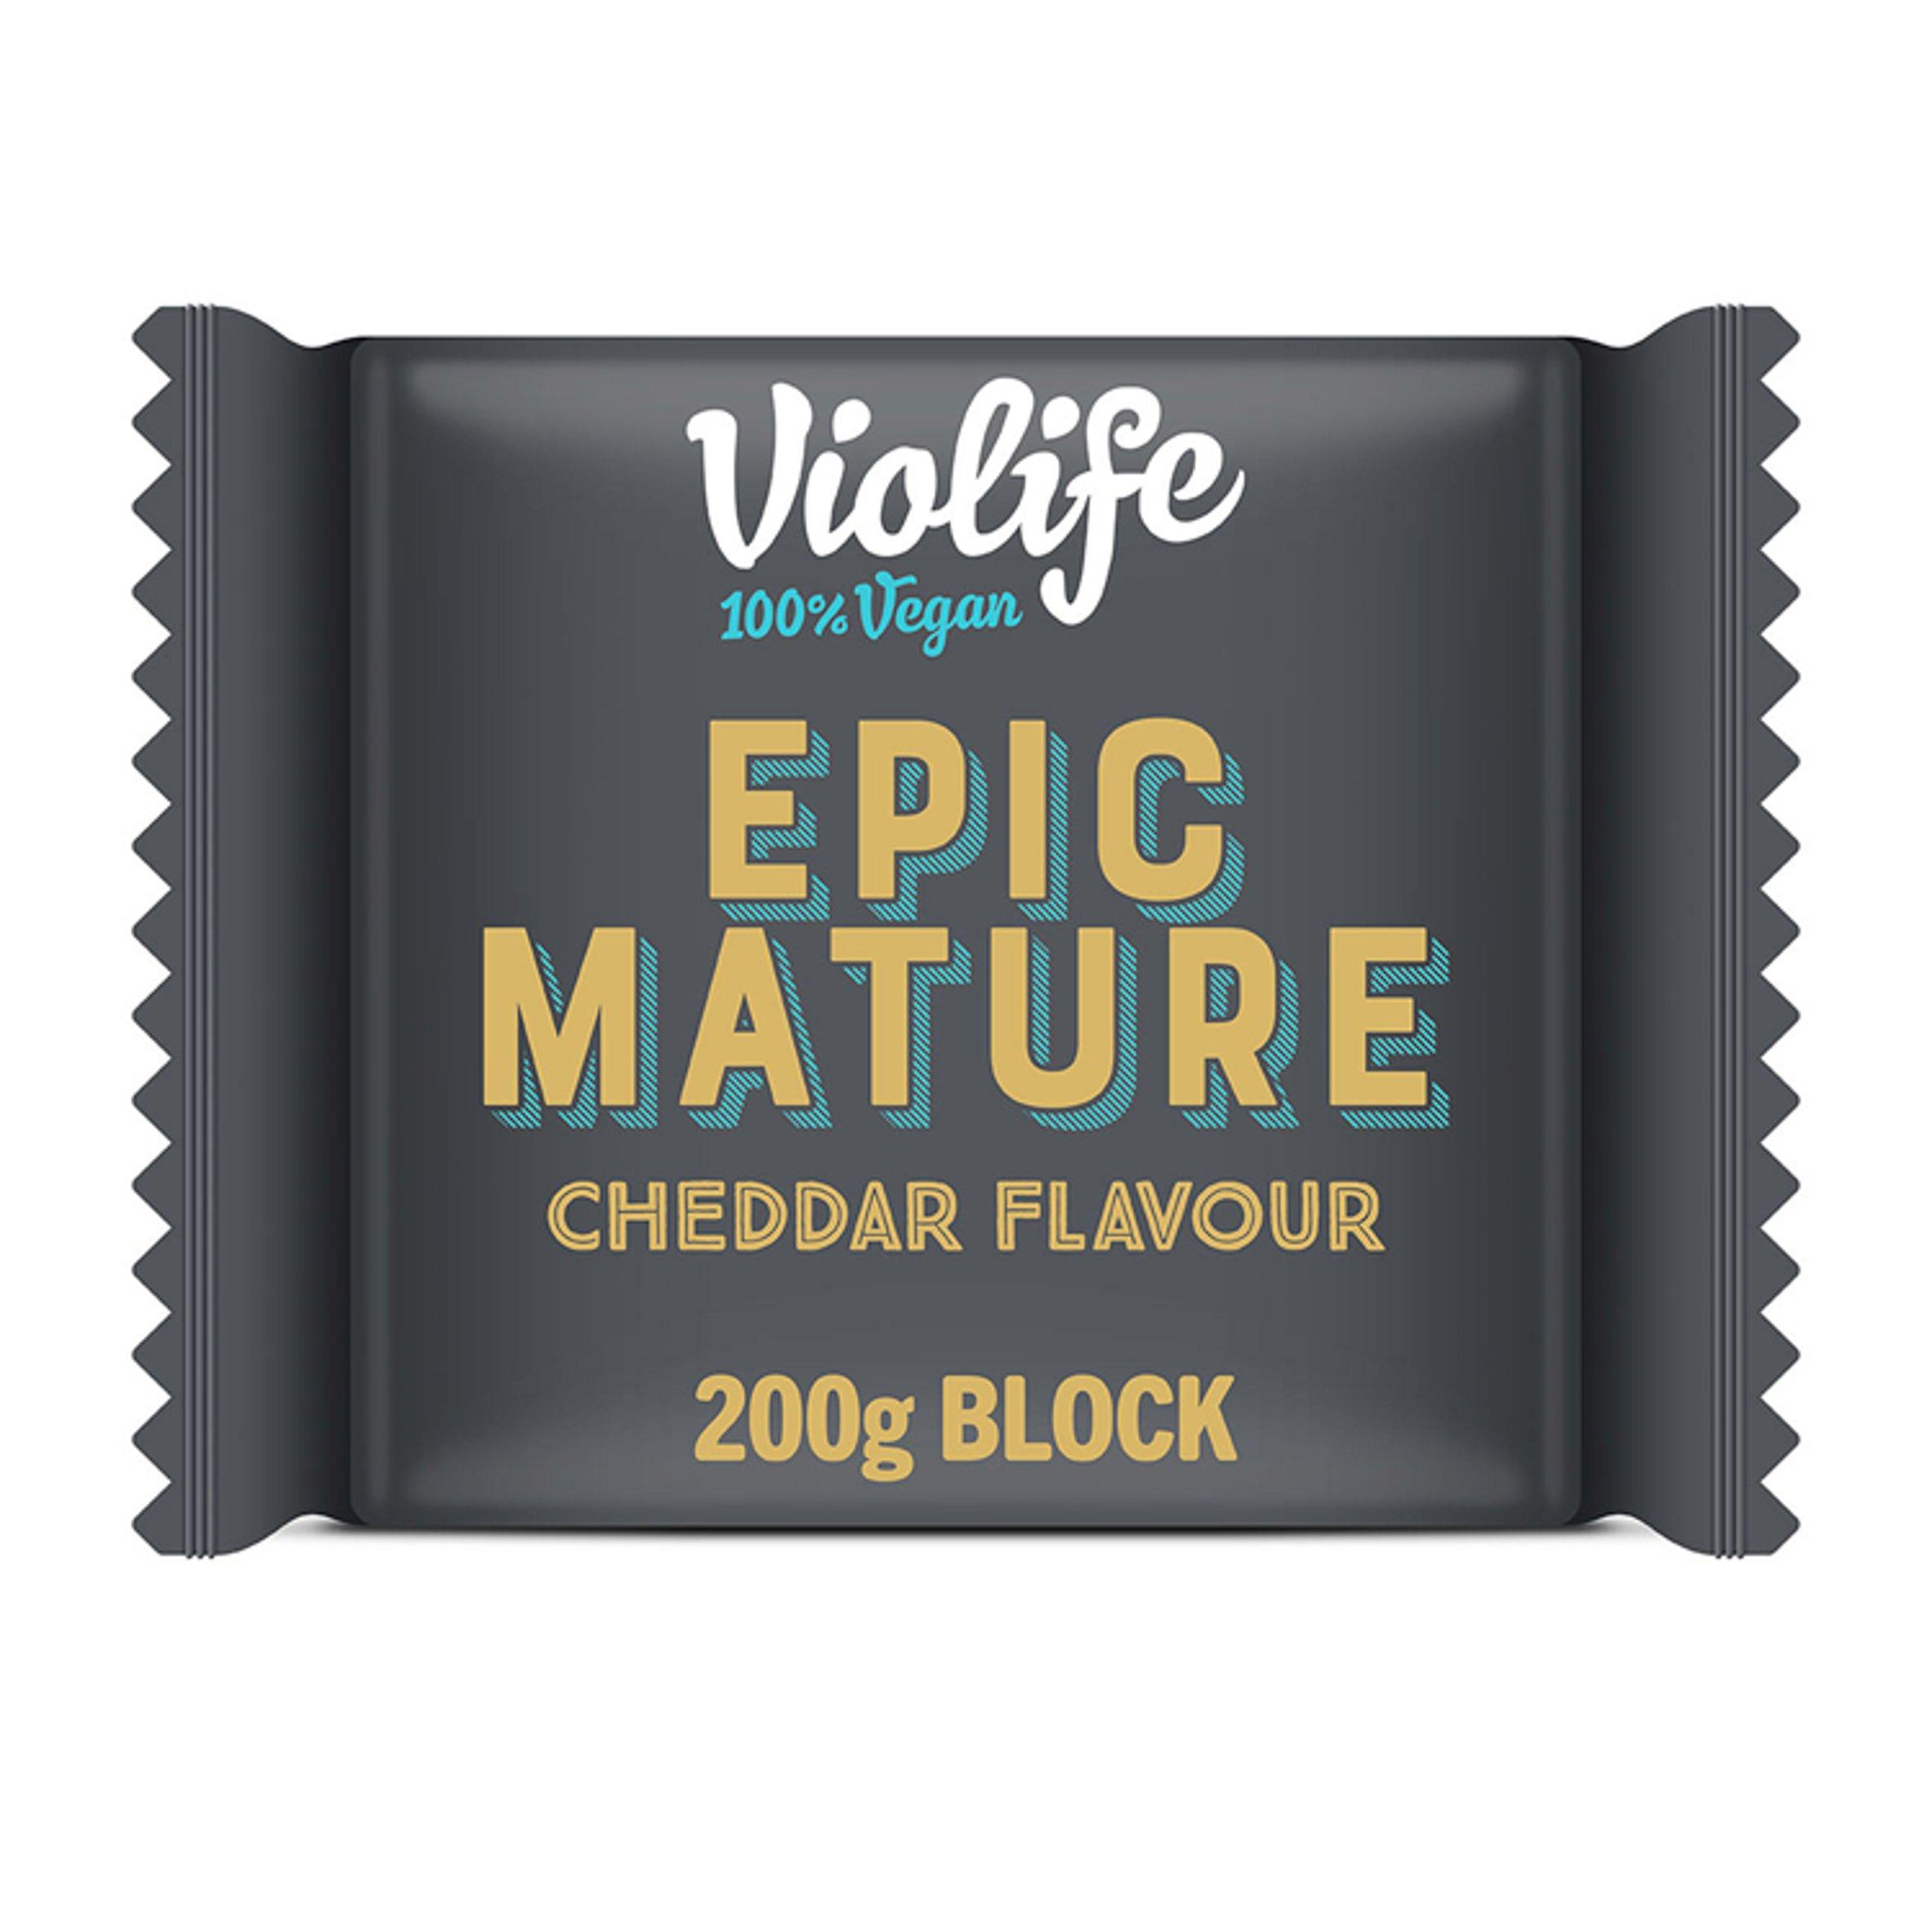 Violife Vegan Epic Mature Cheddar Flavoured Block 200G